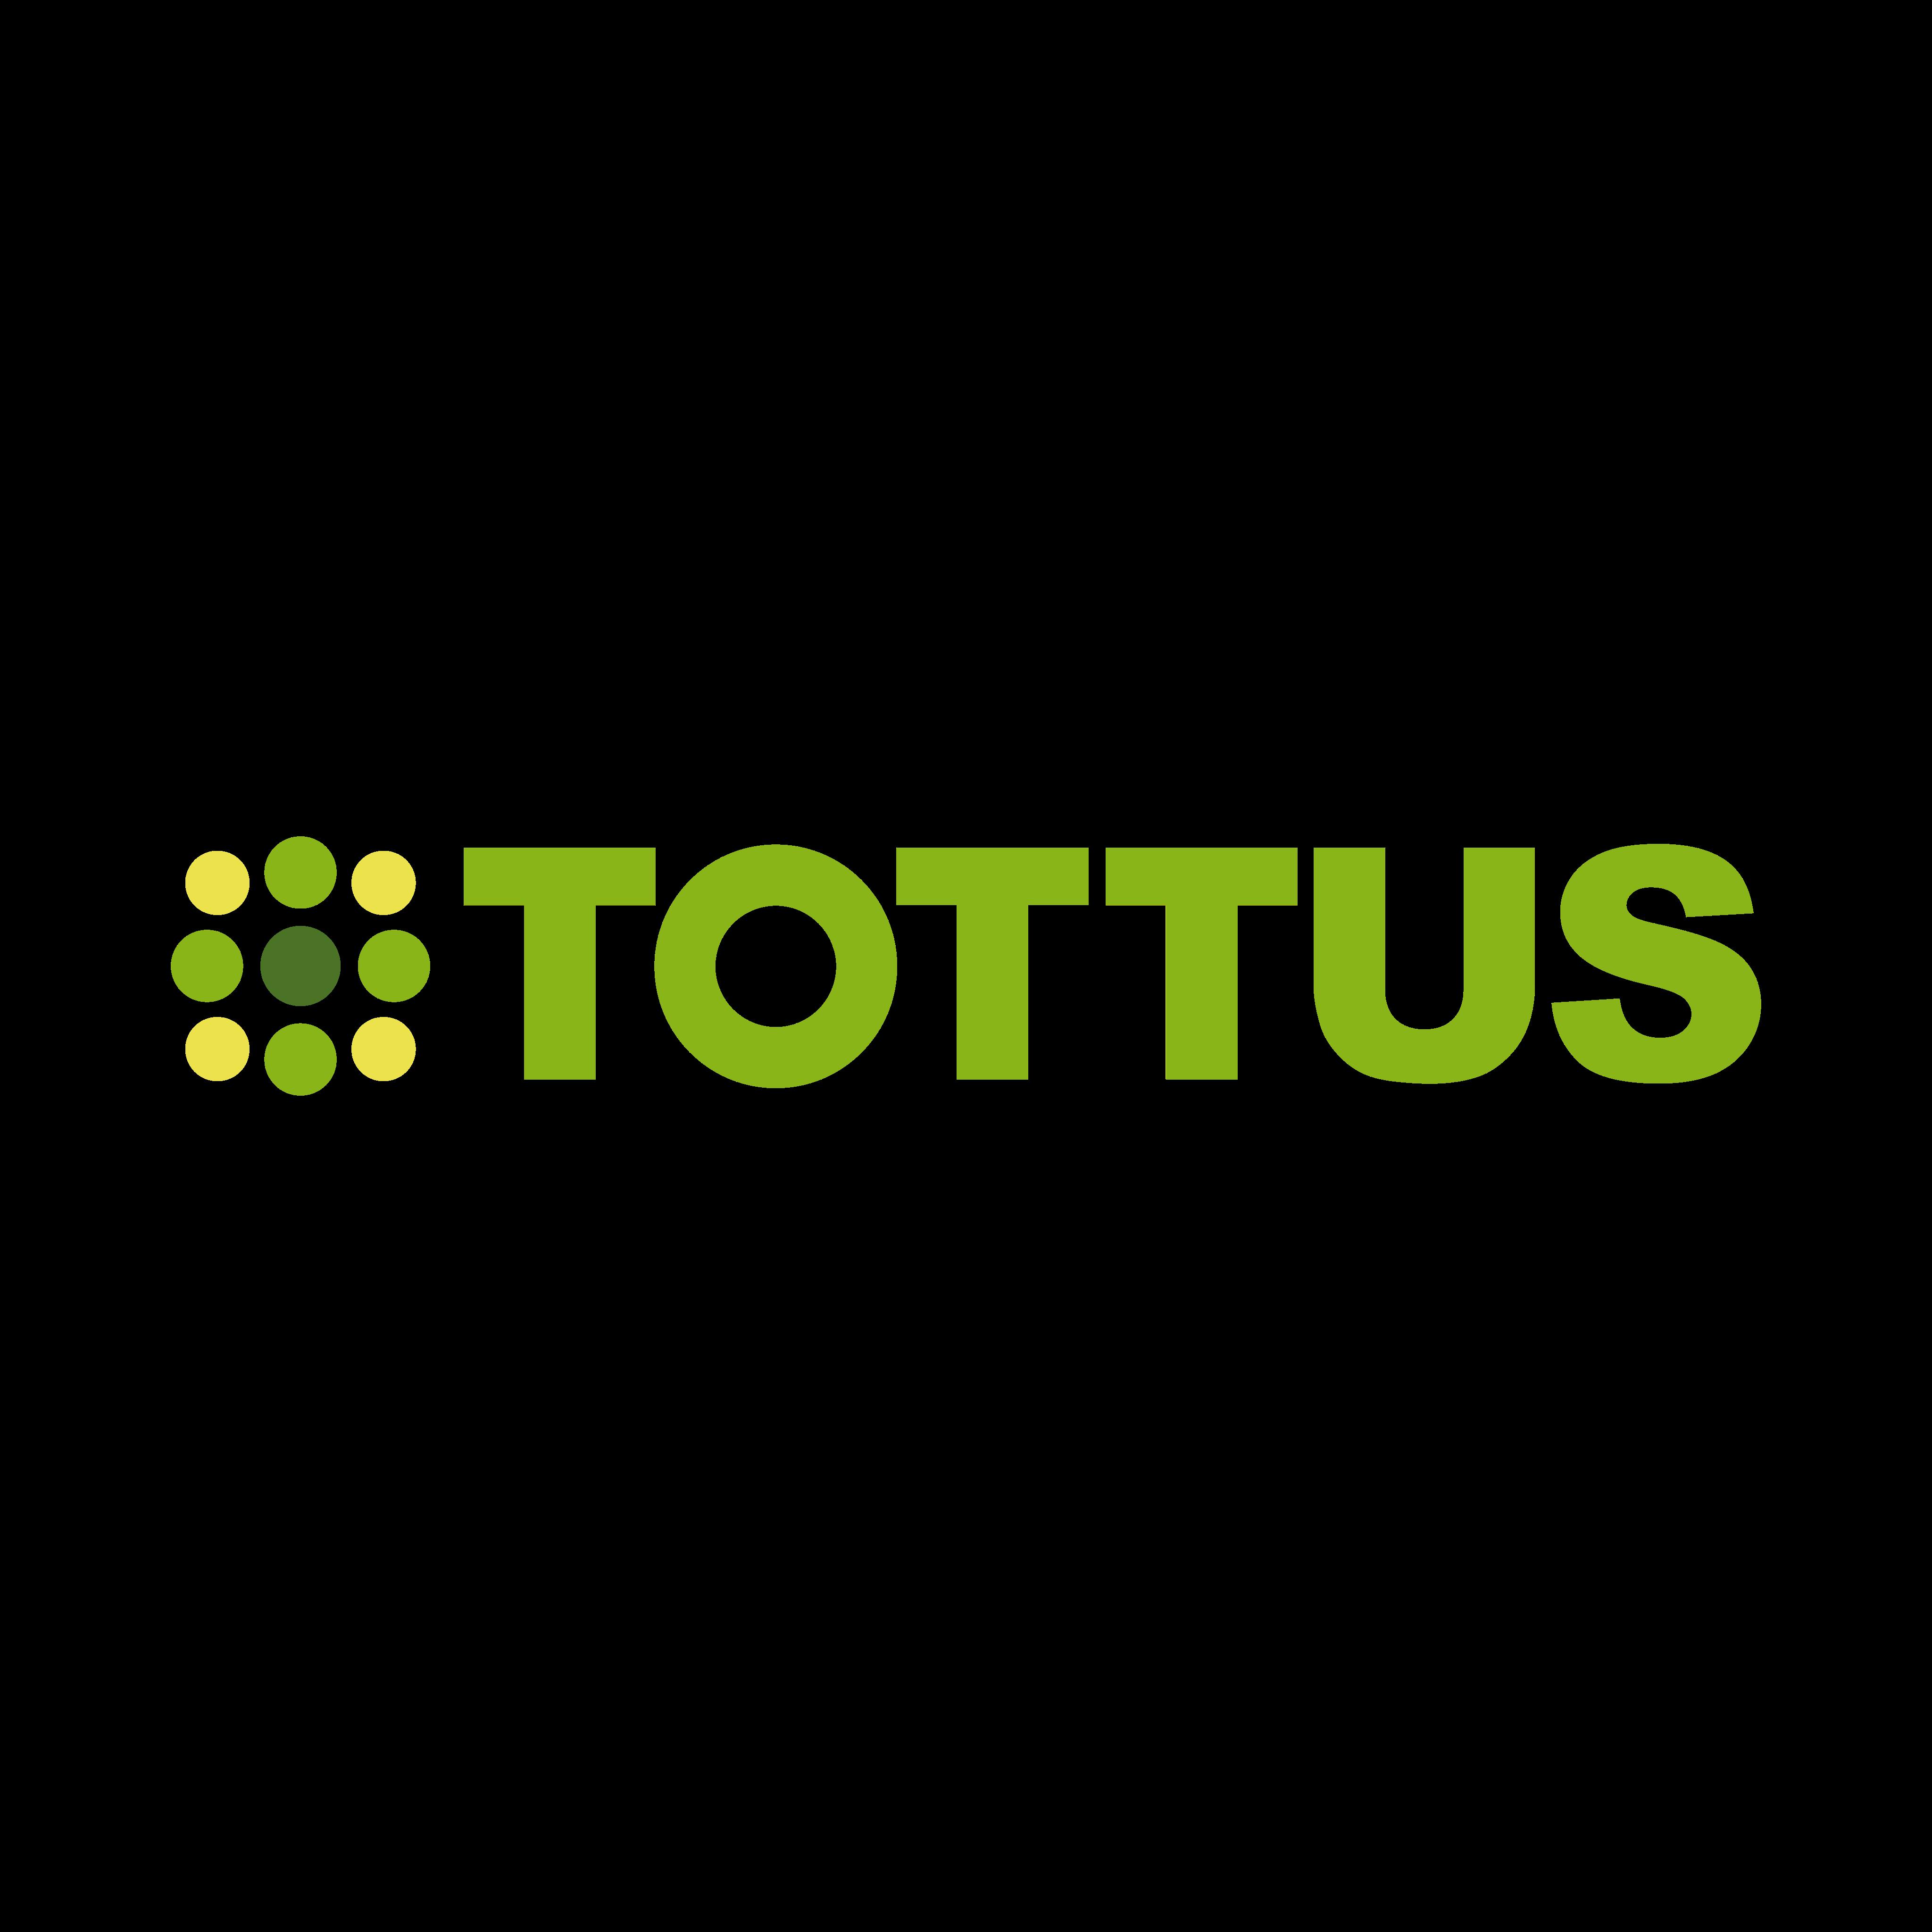 tottus logo 0 - TOTTUS Logo